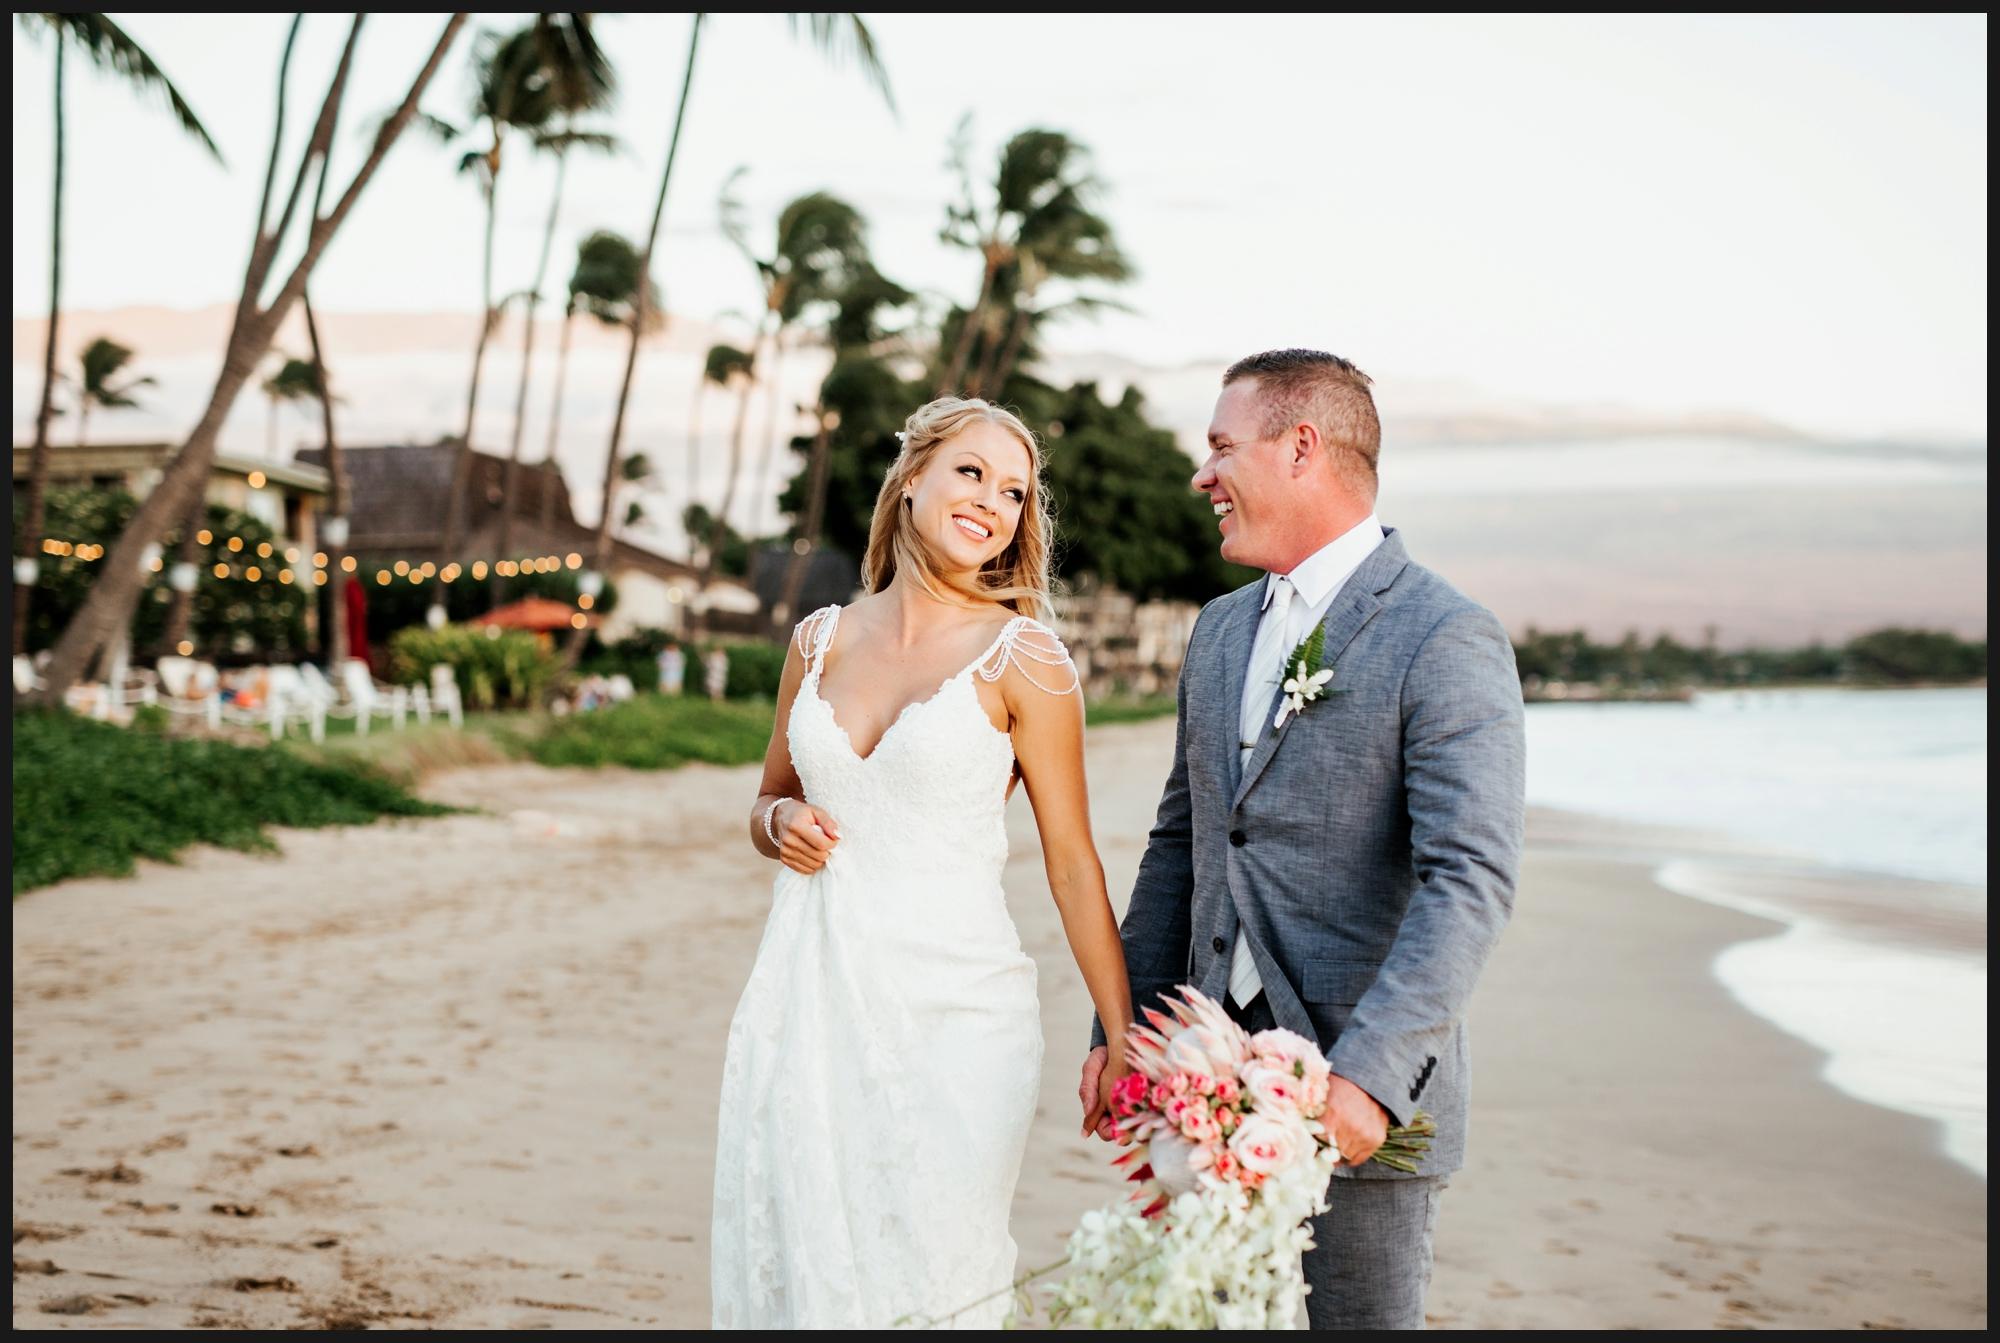 Orlando-Wedding-Photographer-destination-wedding-photographer-florida-wedding-photographer-hawaii-wedding-photographer_0079.jpg